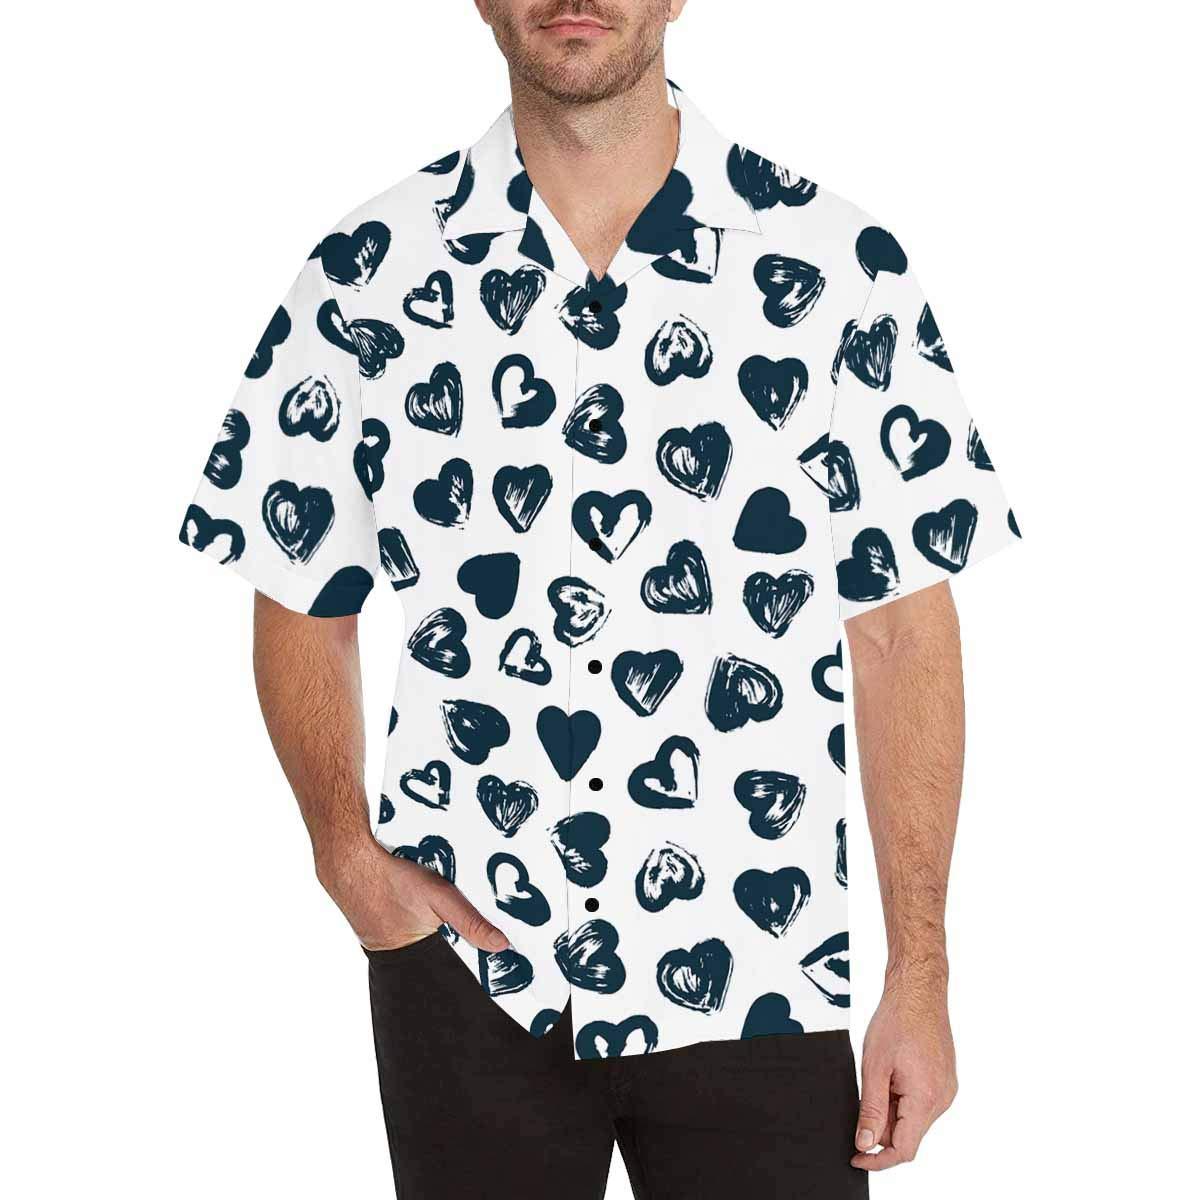 InterestPrint Mens Shirt Green Background with Spirals Short Sleeve Casual Button Up Mens Shirts